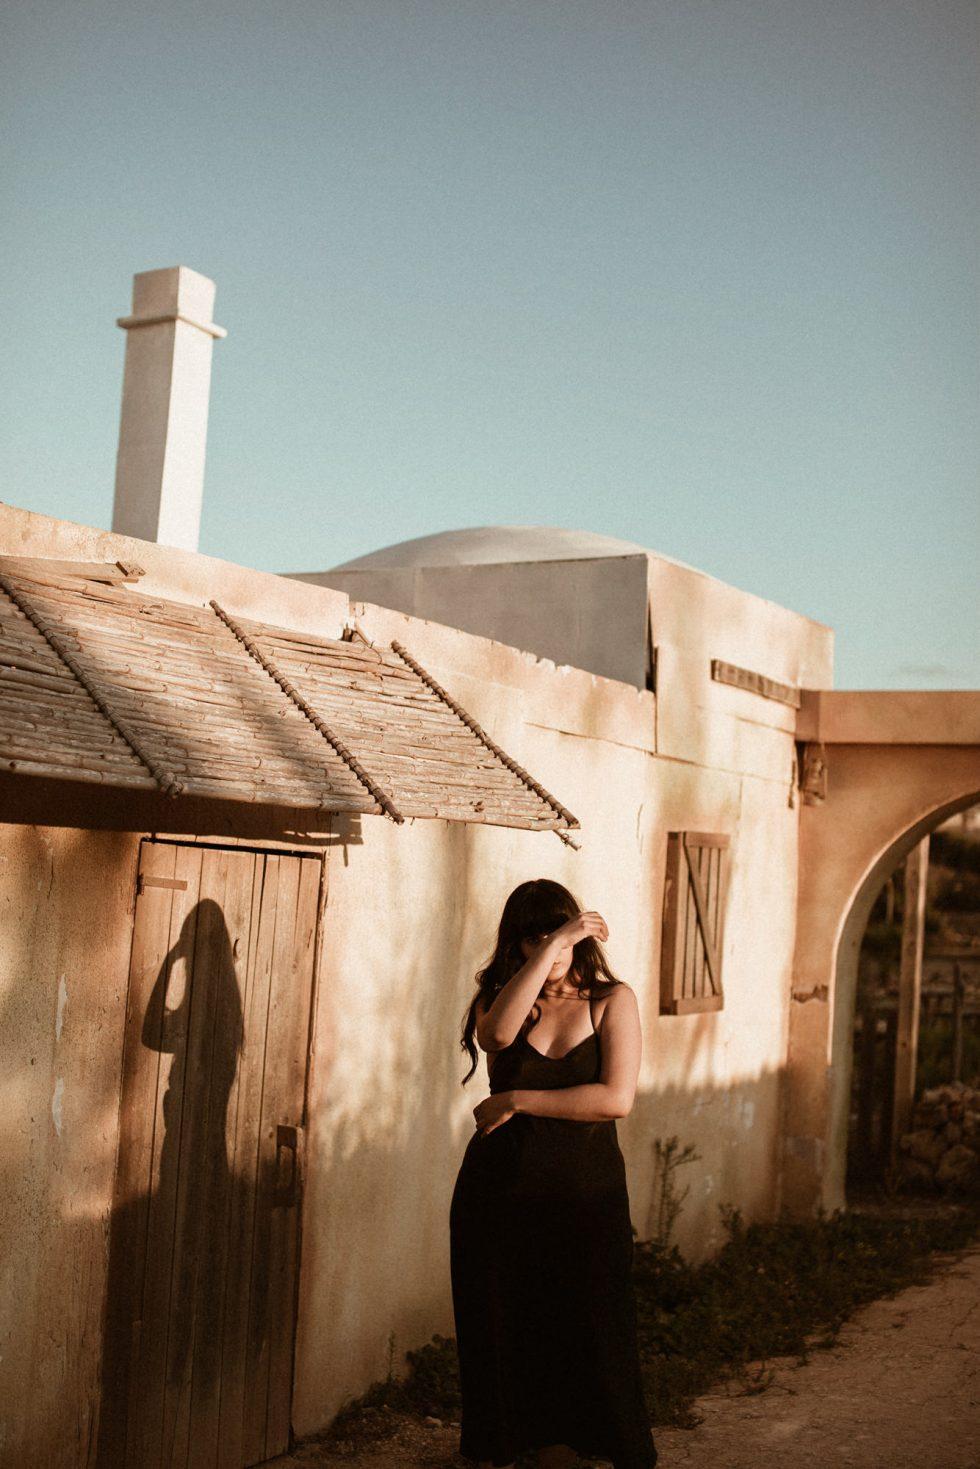 malta-travel-lifestyle-photographer-laura-g-diaz